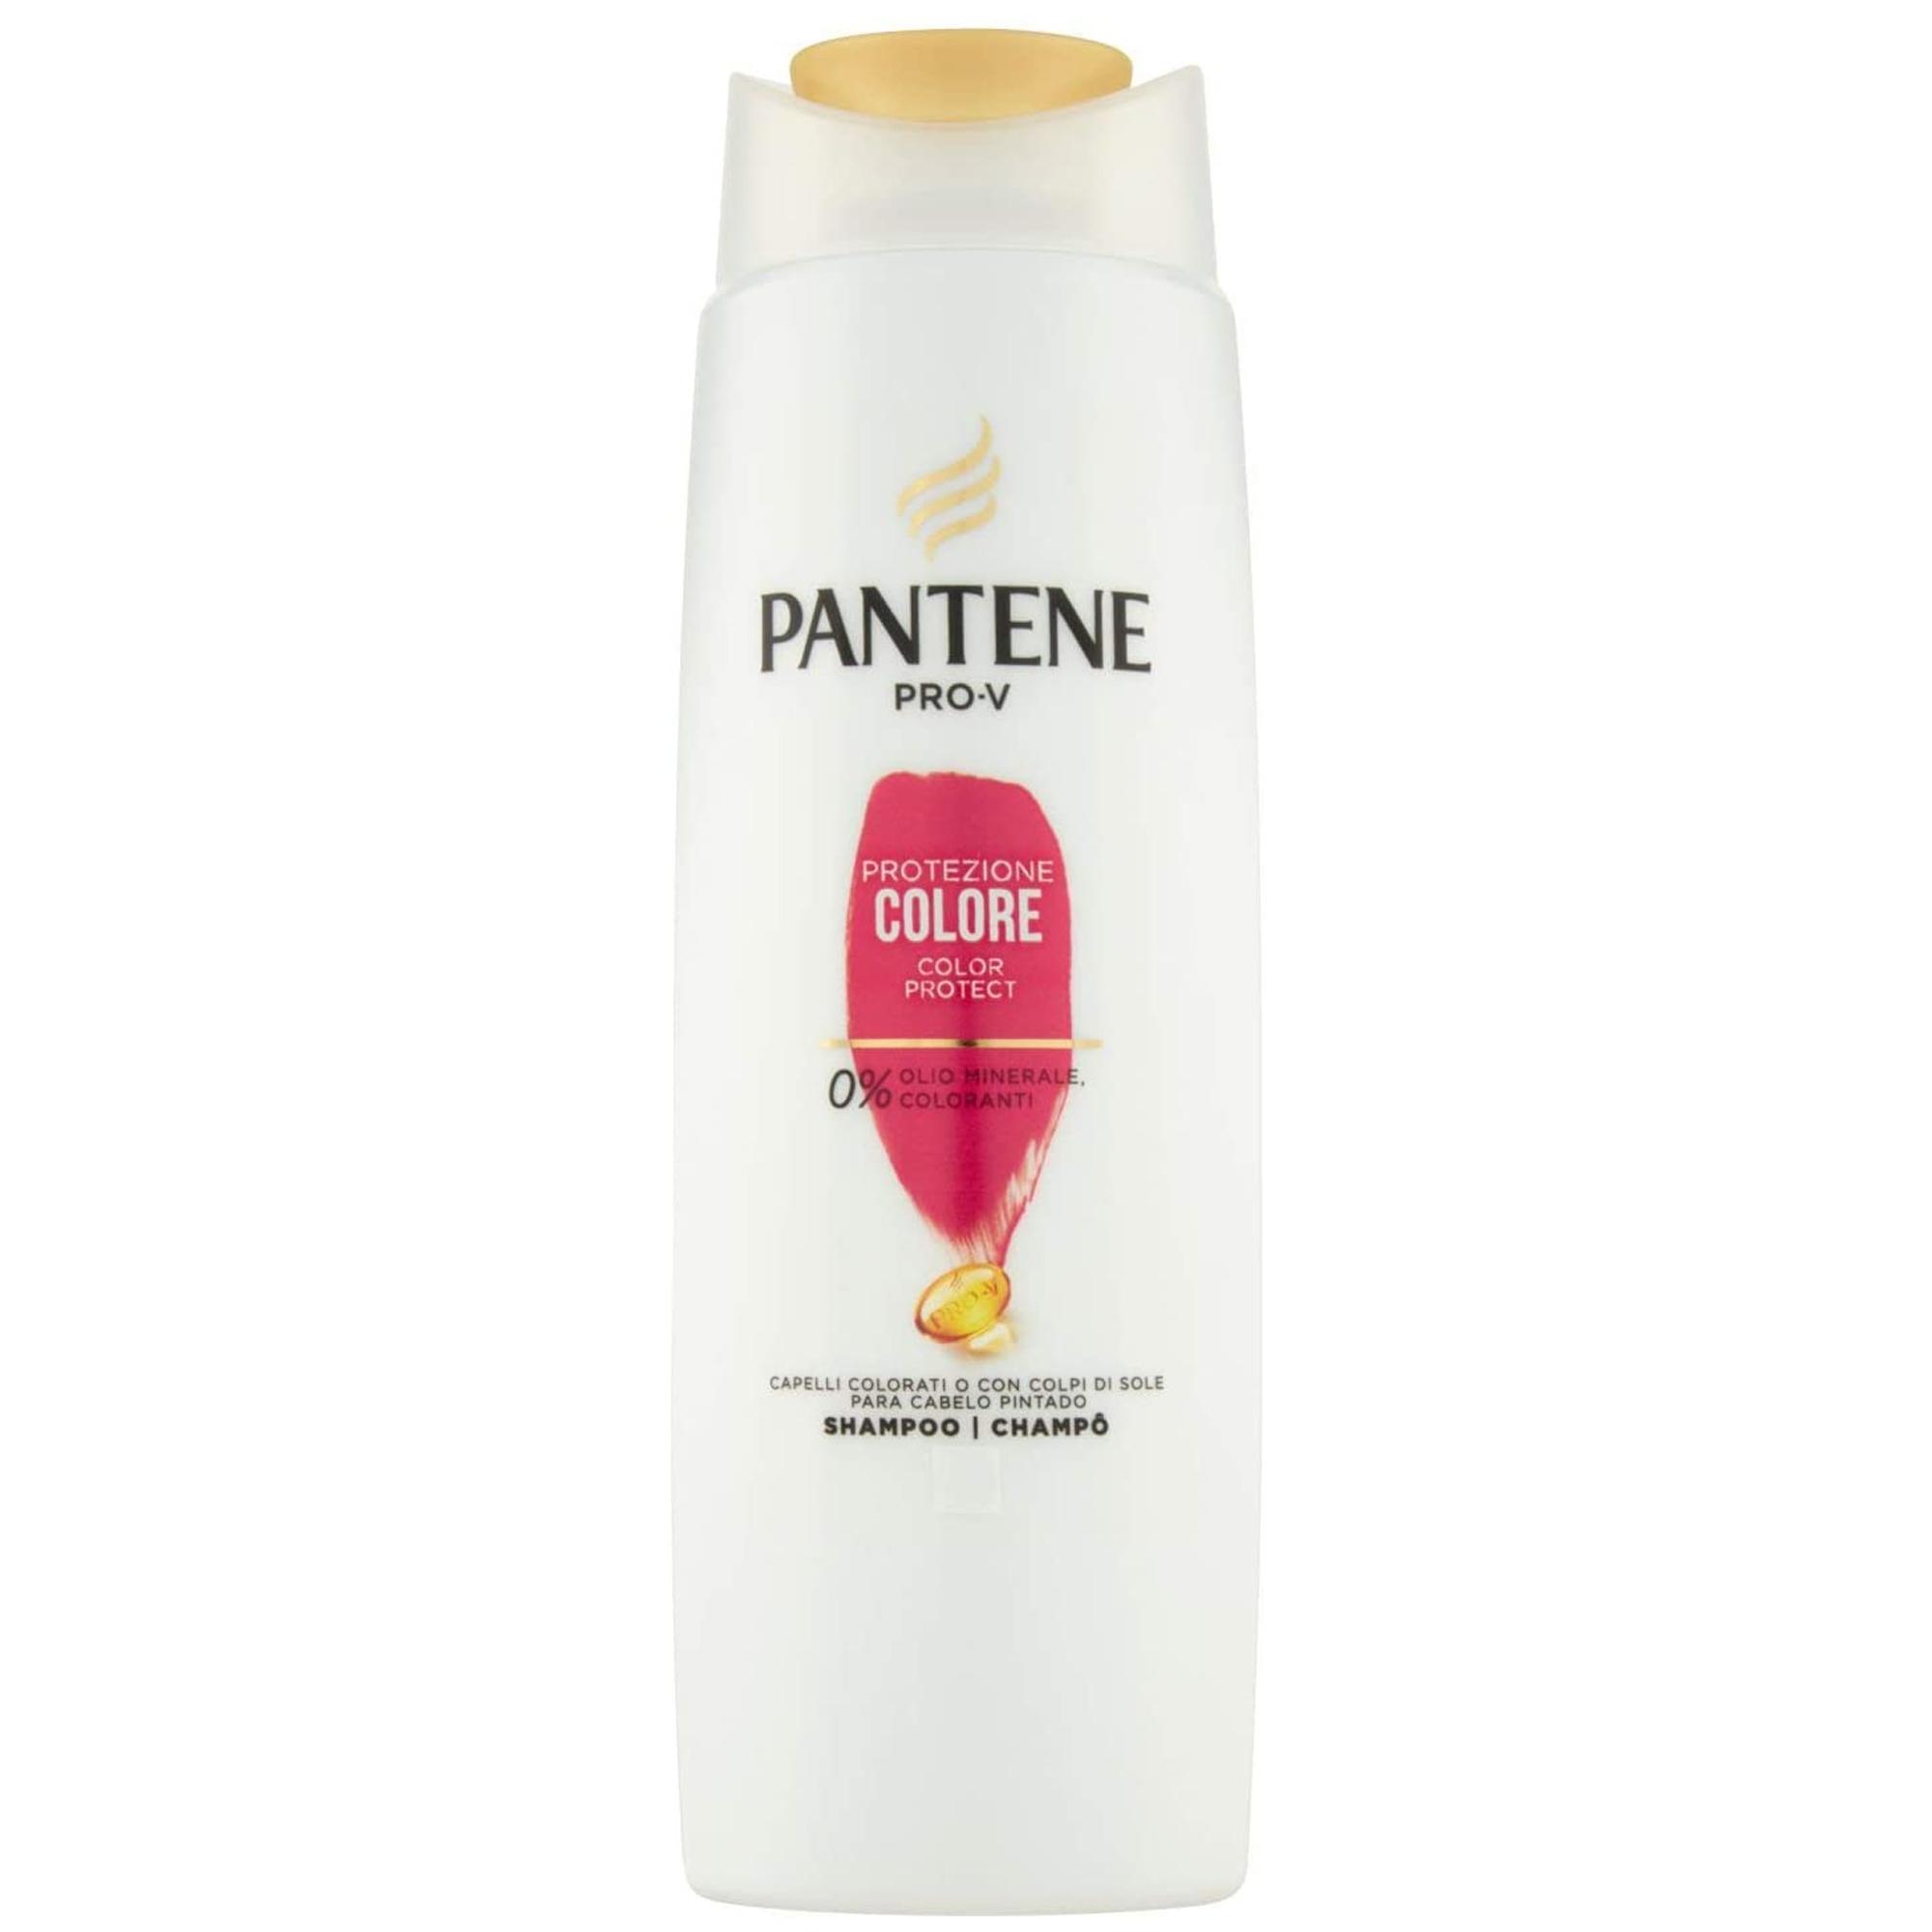 Pantene colore Shampoo 250ml